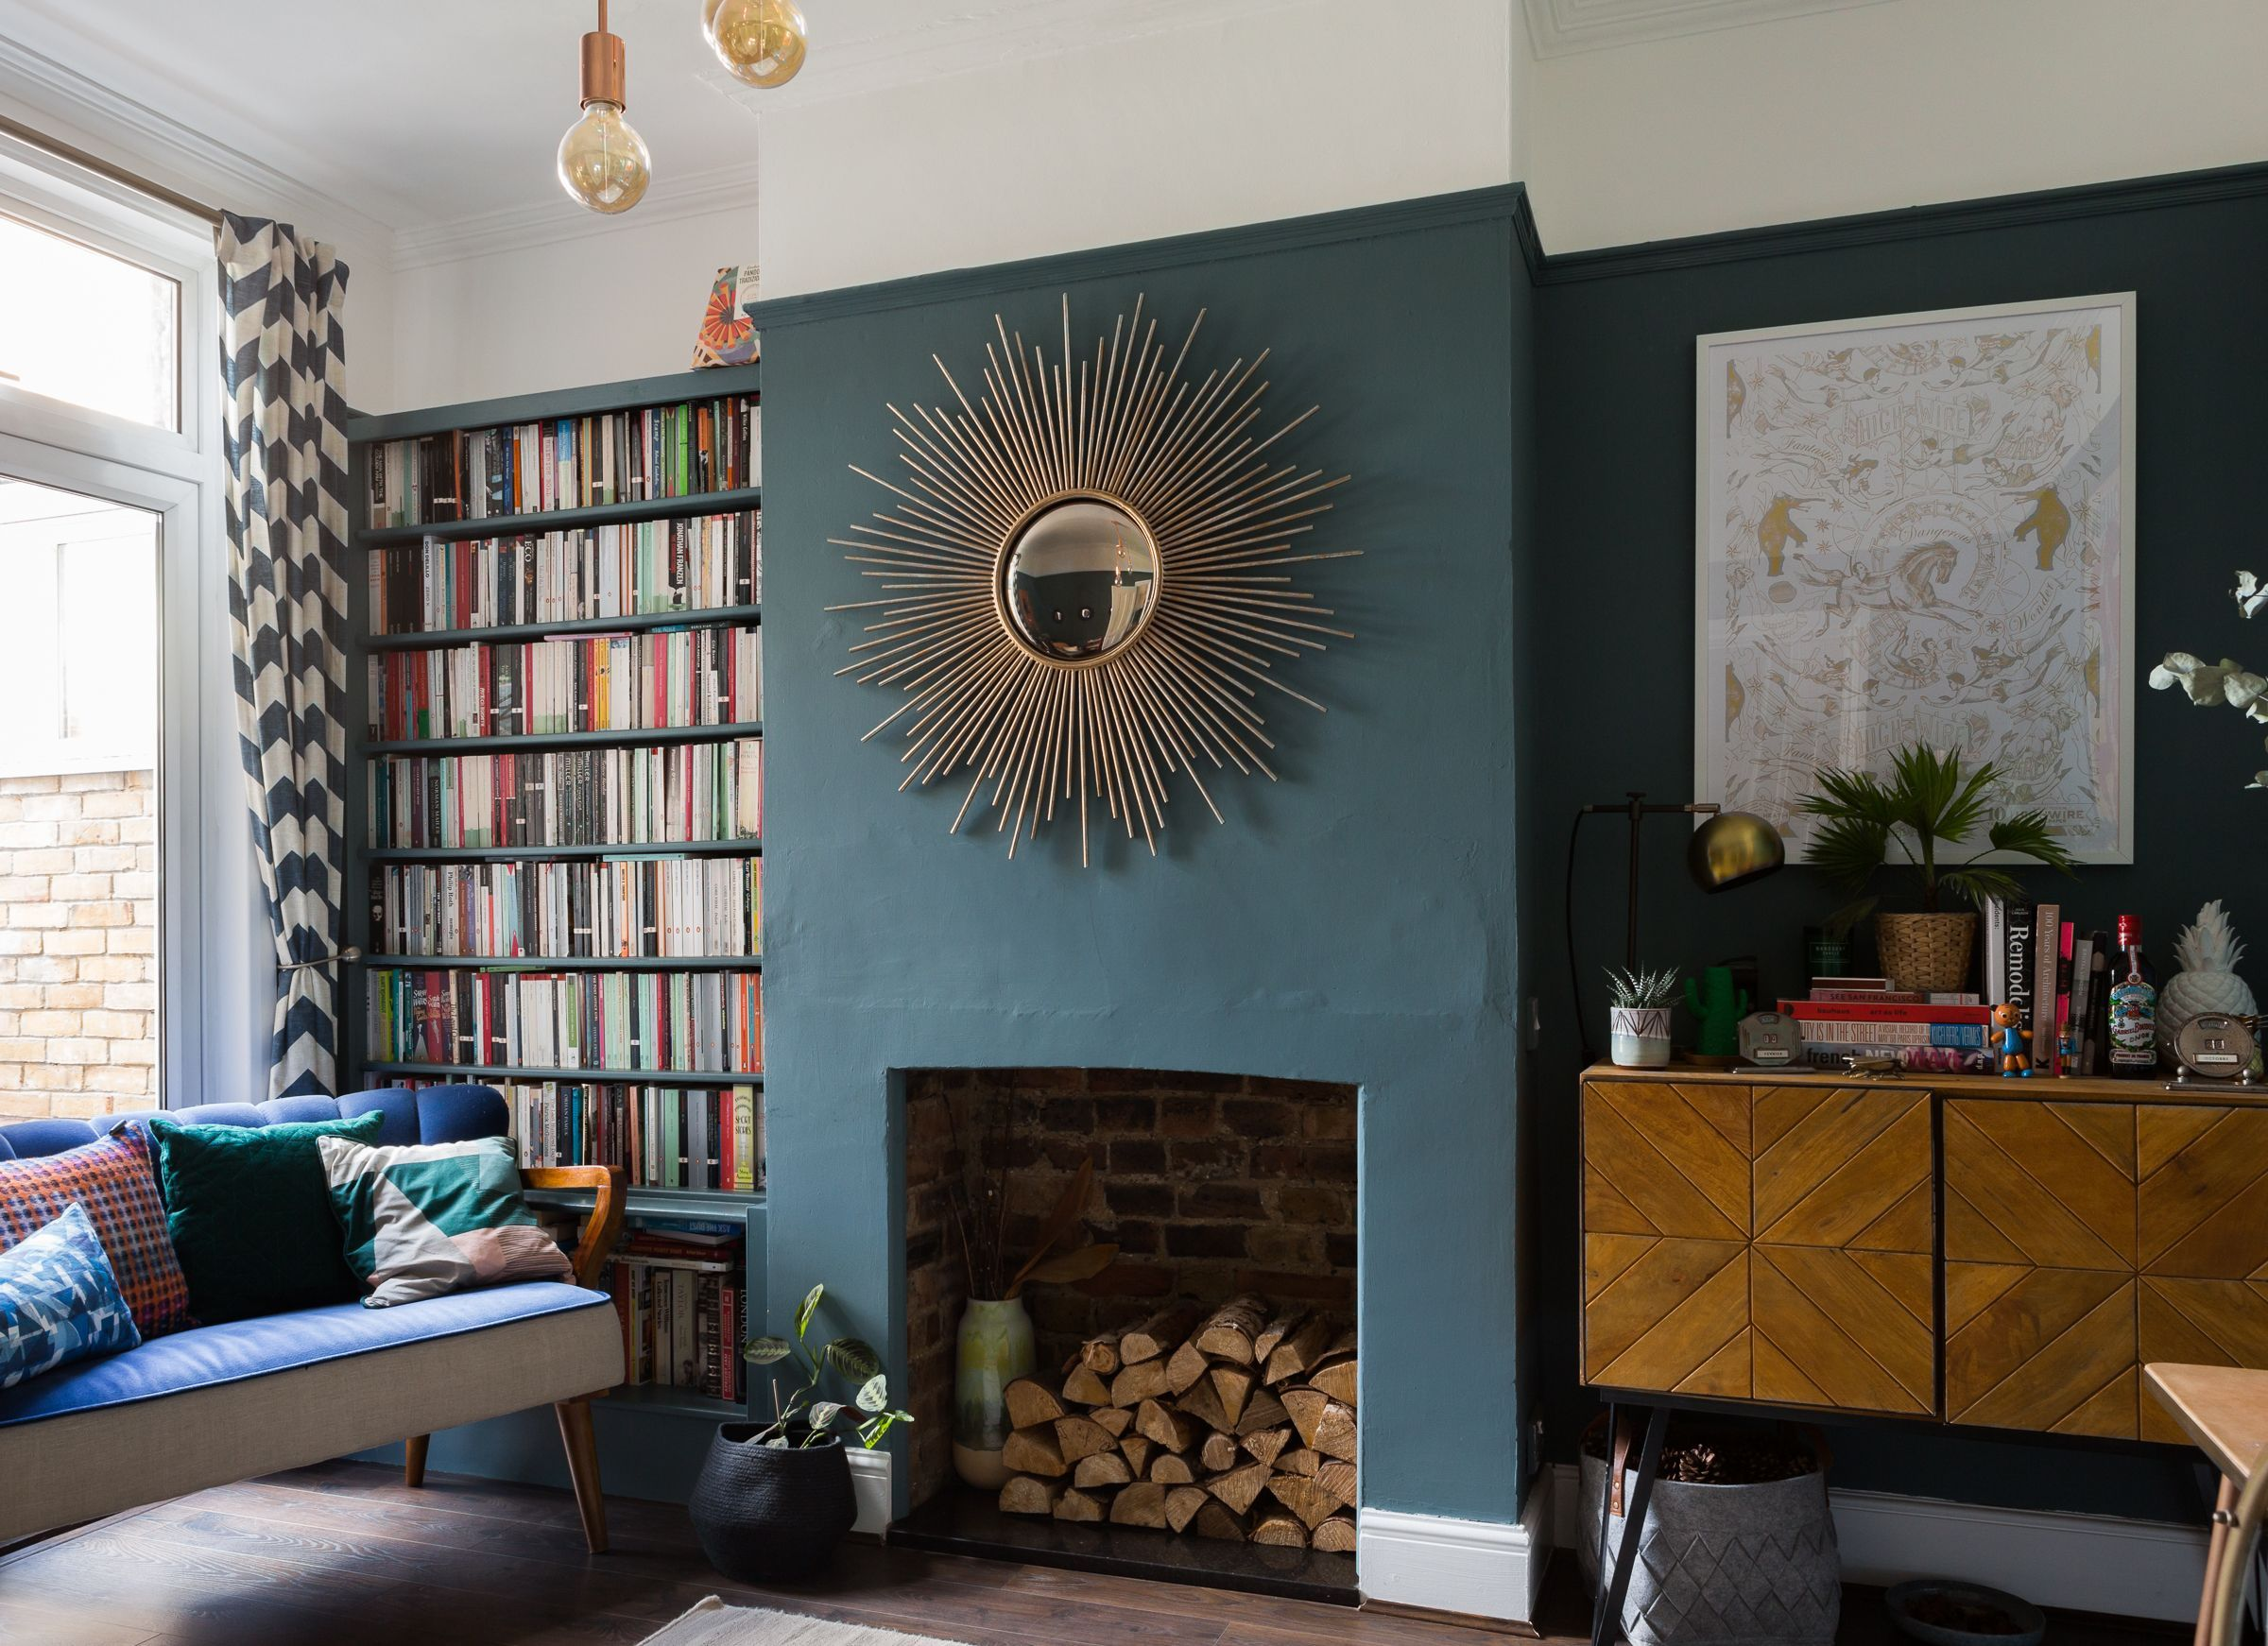 Design Soda Blogger And Interior Stylist Ruth Matthews Shares This